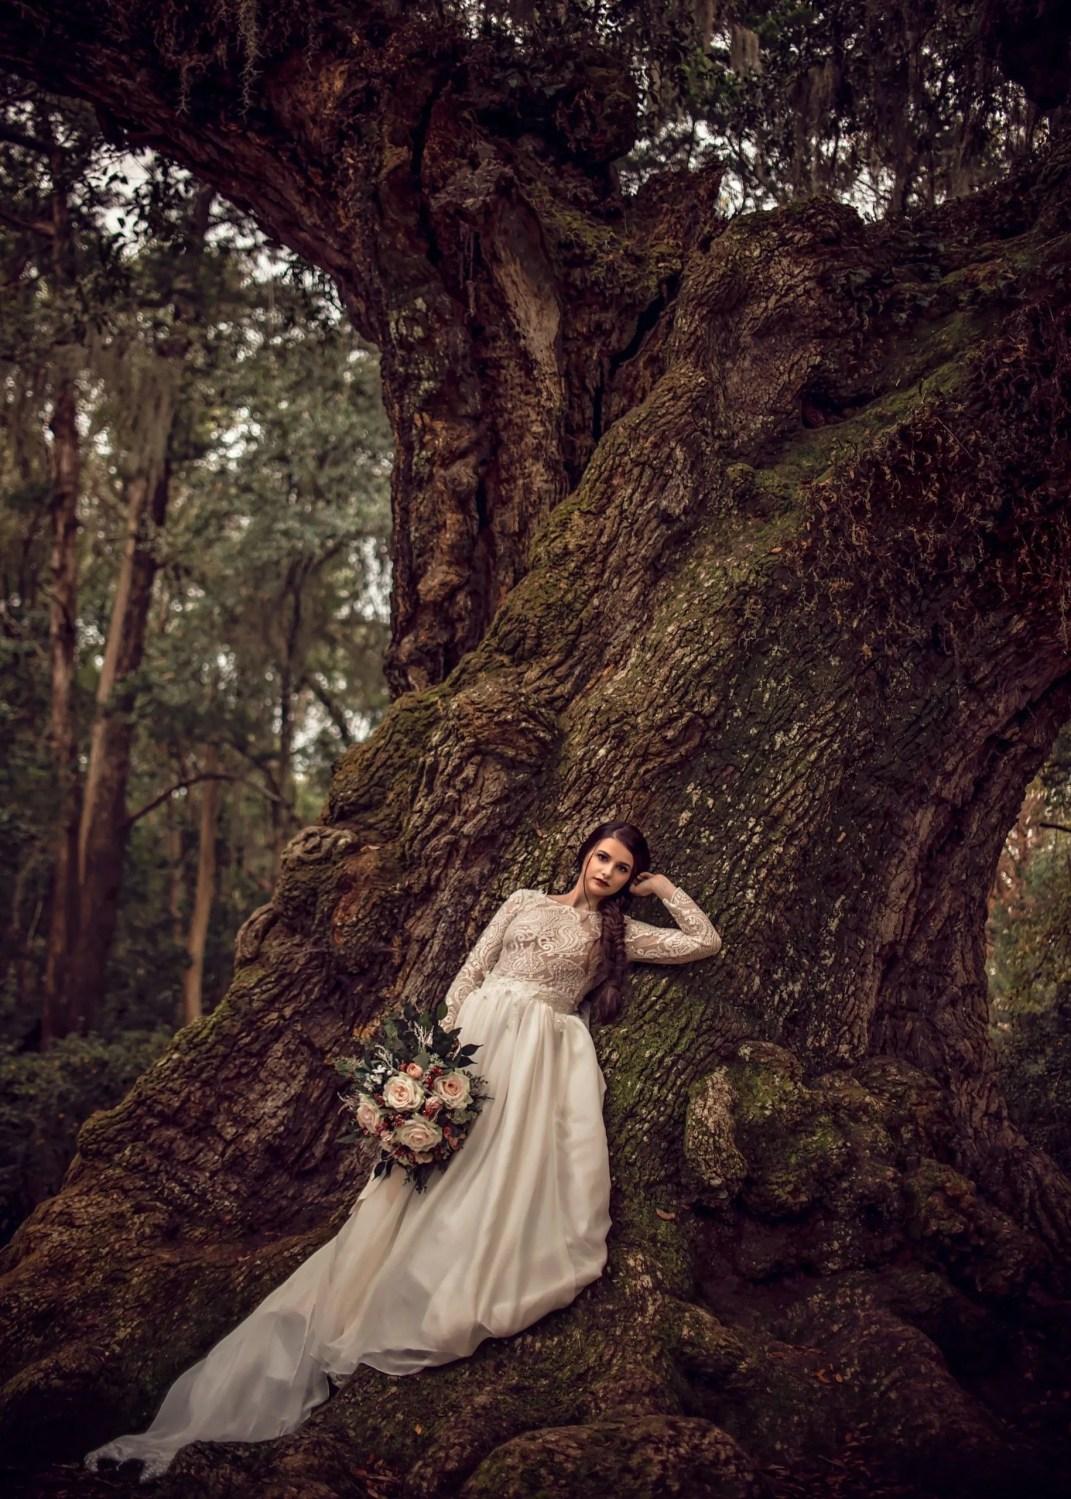 award winning bridal portrait of beautiful bride leaning on tree